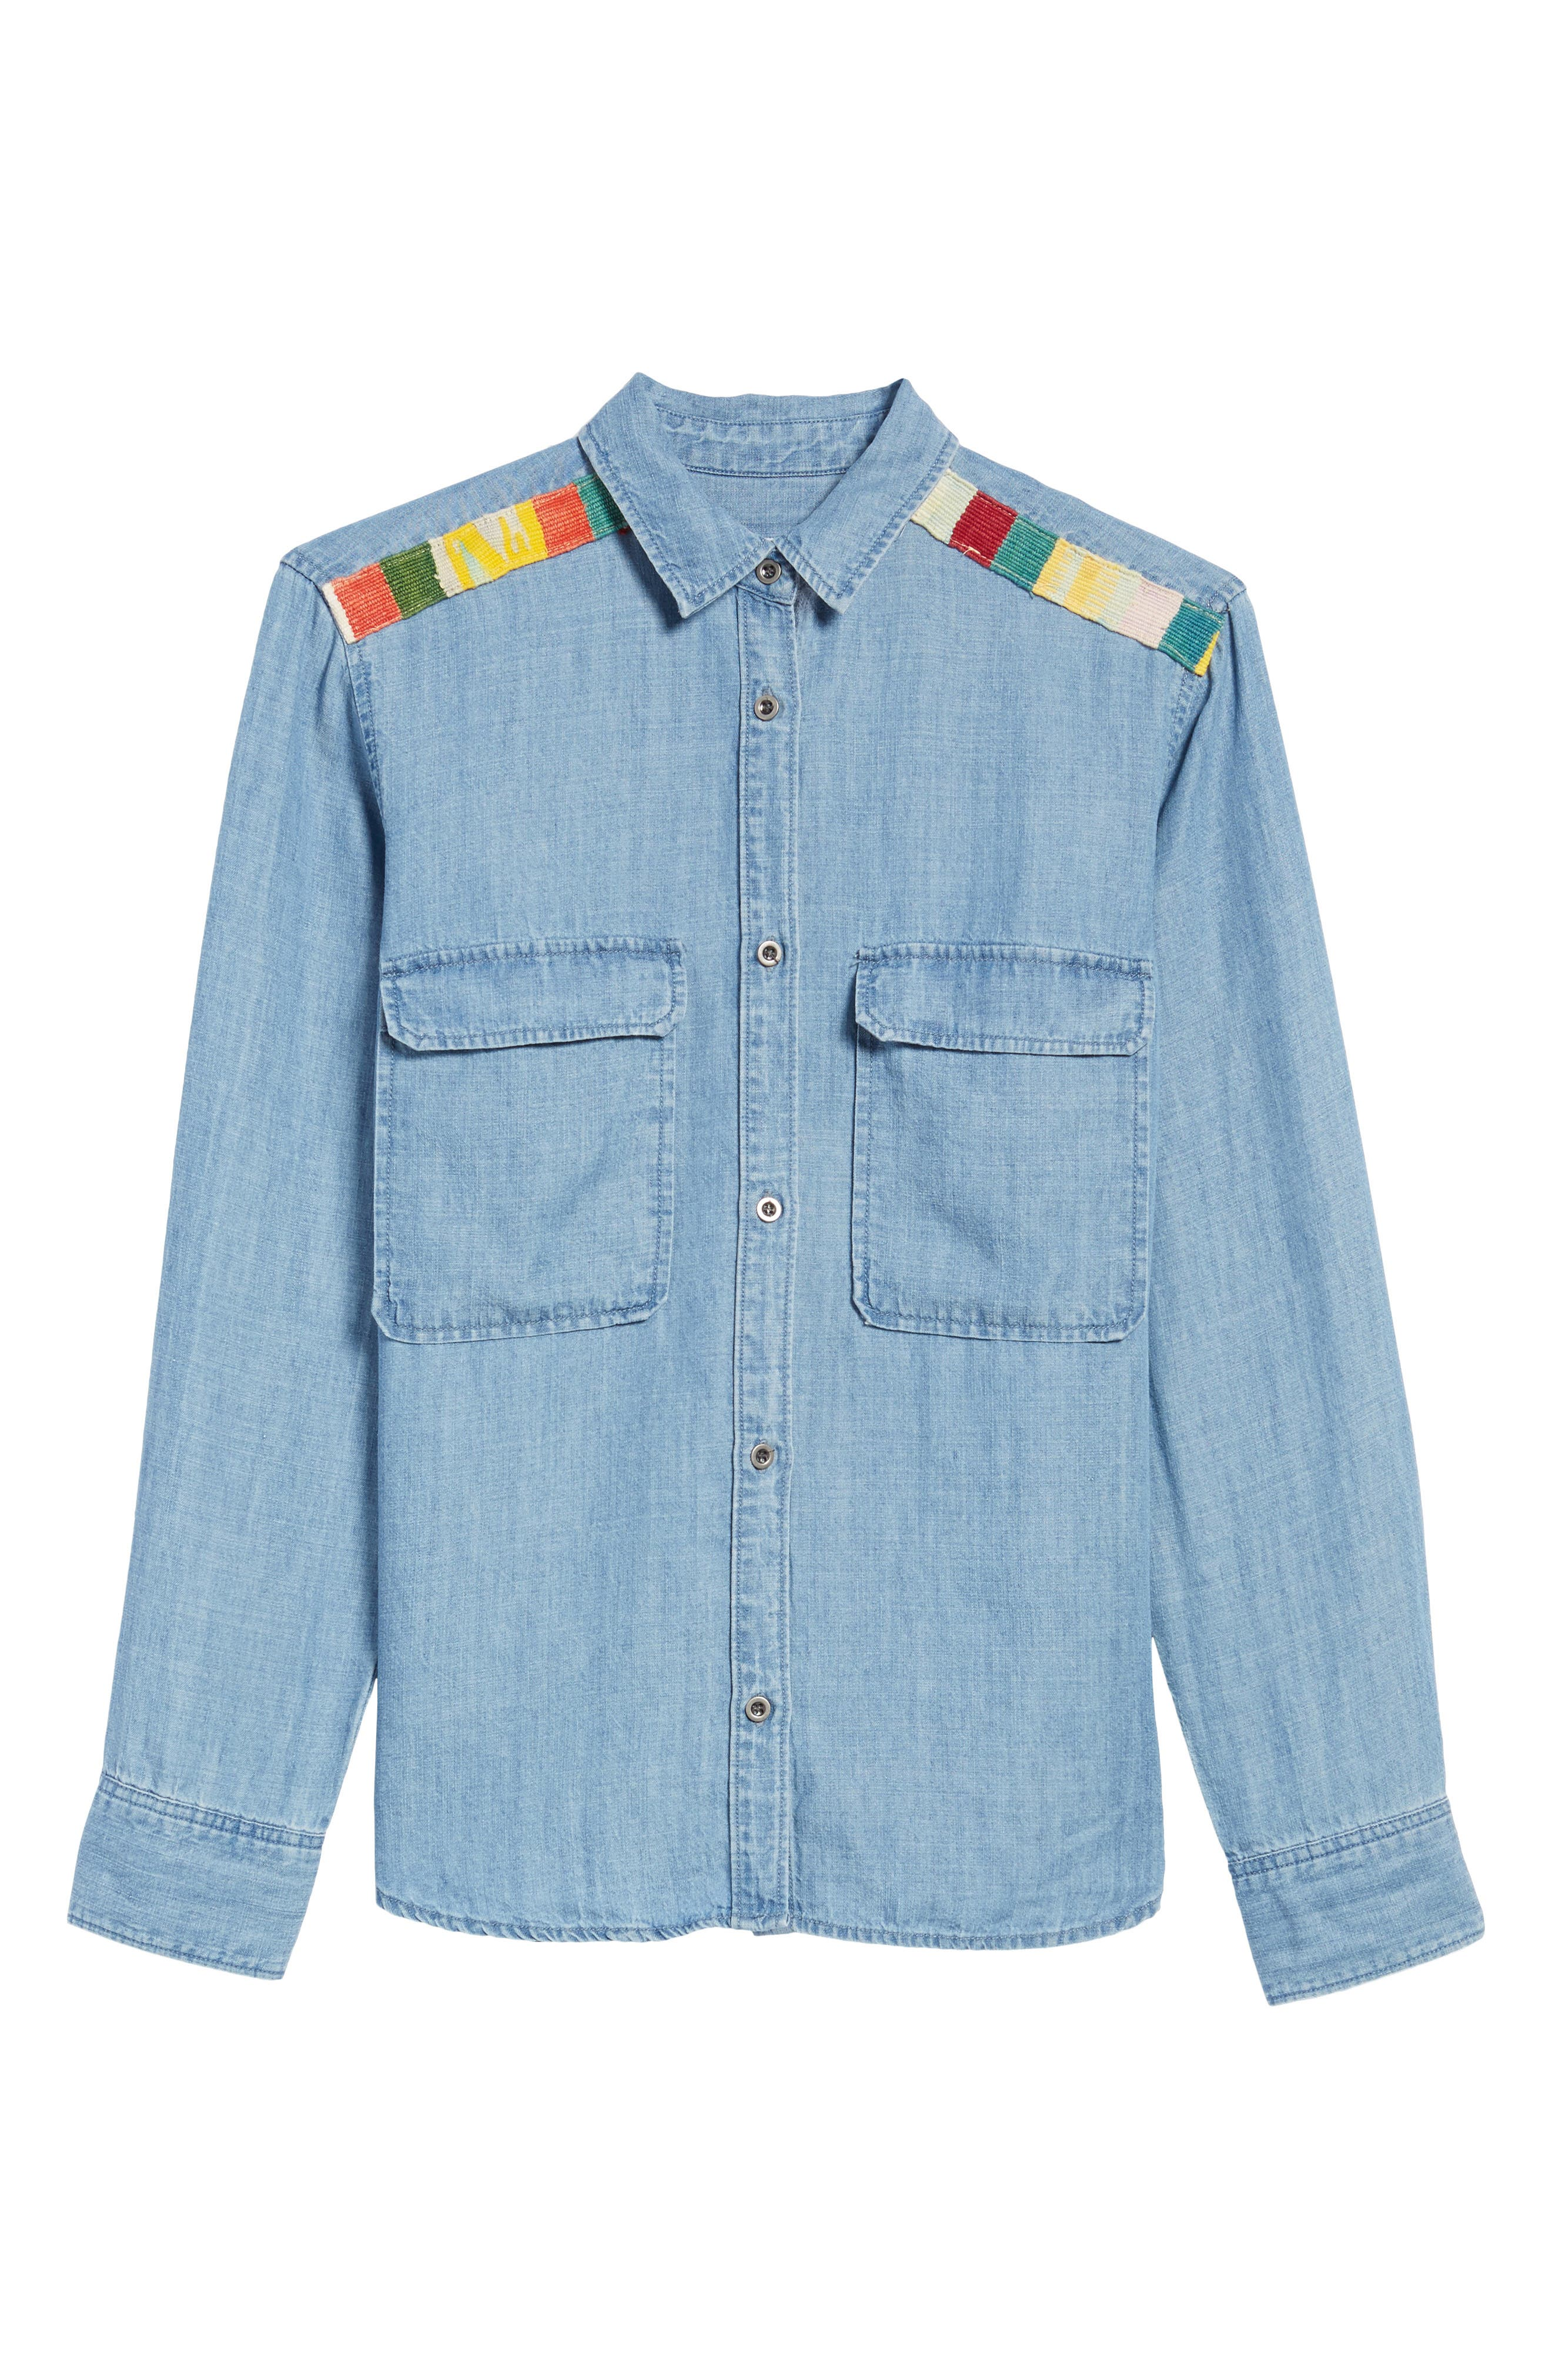 Jimi Chambray Shirt,                             Alternate thumbnail 6, color,                             Medium Vintage Wash